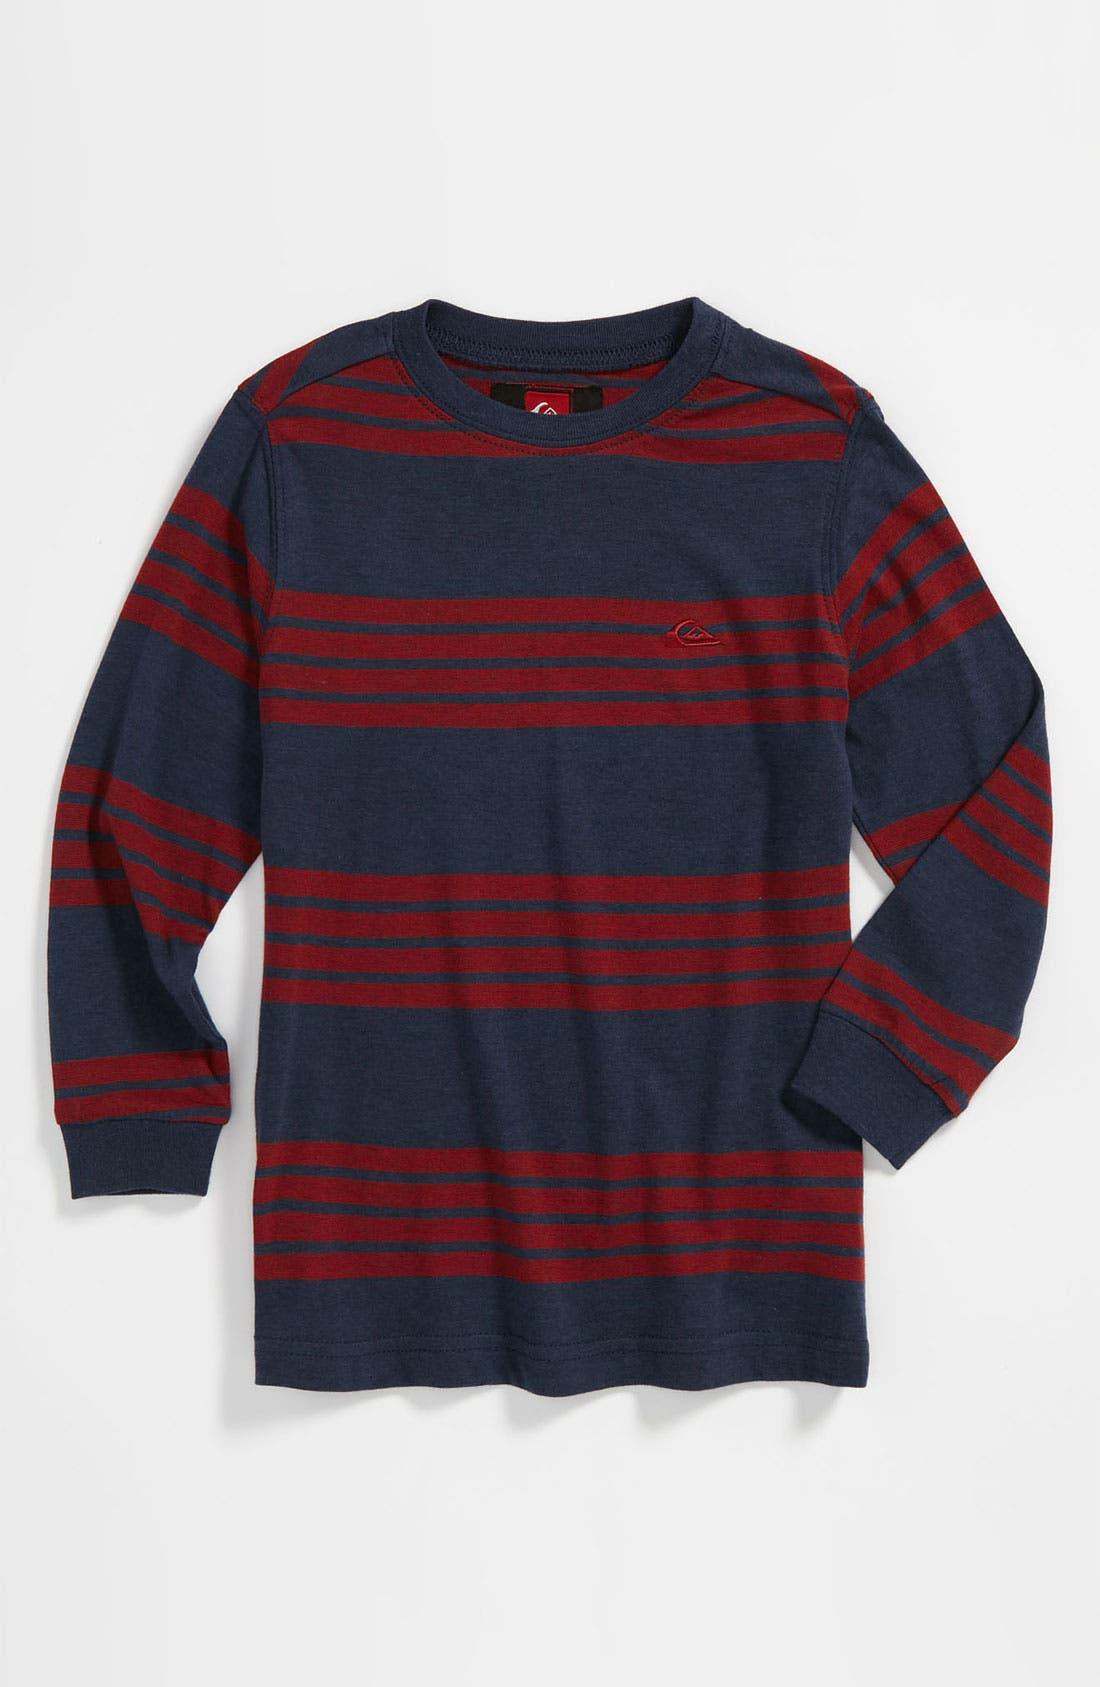 Alternate Image 1 Selected - Quiksilver 'Kinser' T-Shirt (Infant)